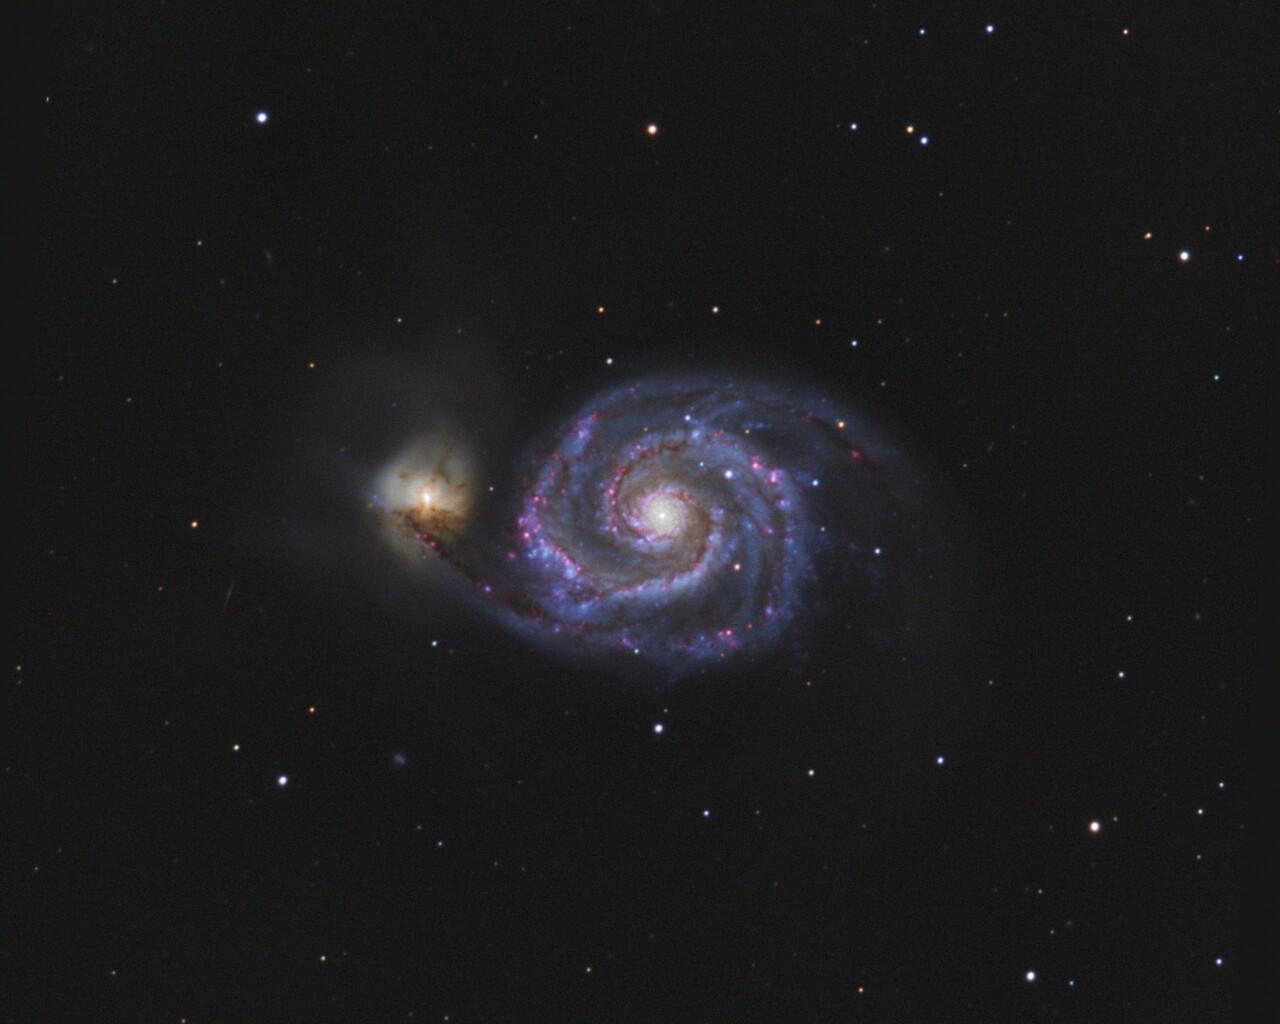 Andrew Marjama_M51 - Whirlpool Galaxy.jpg